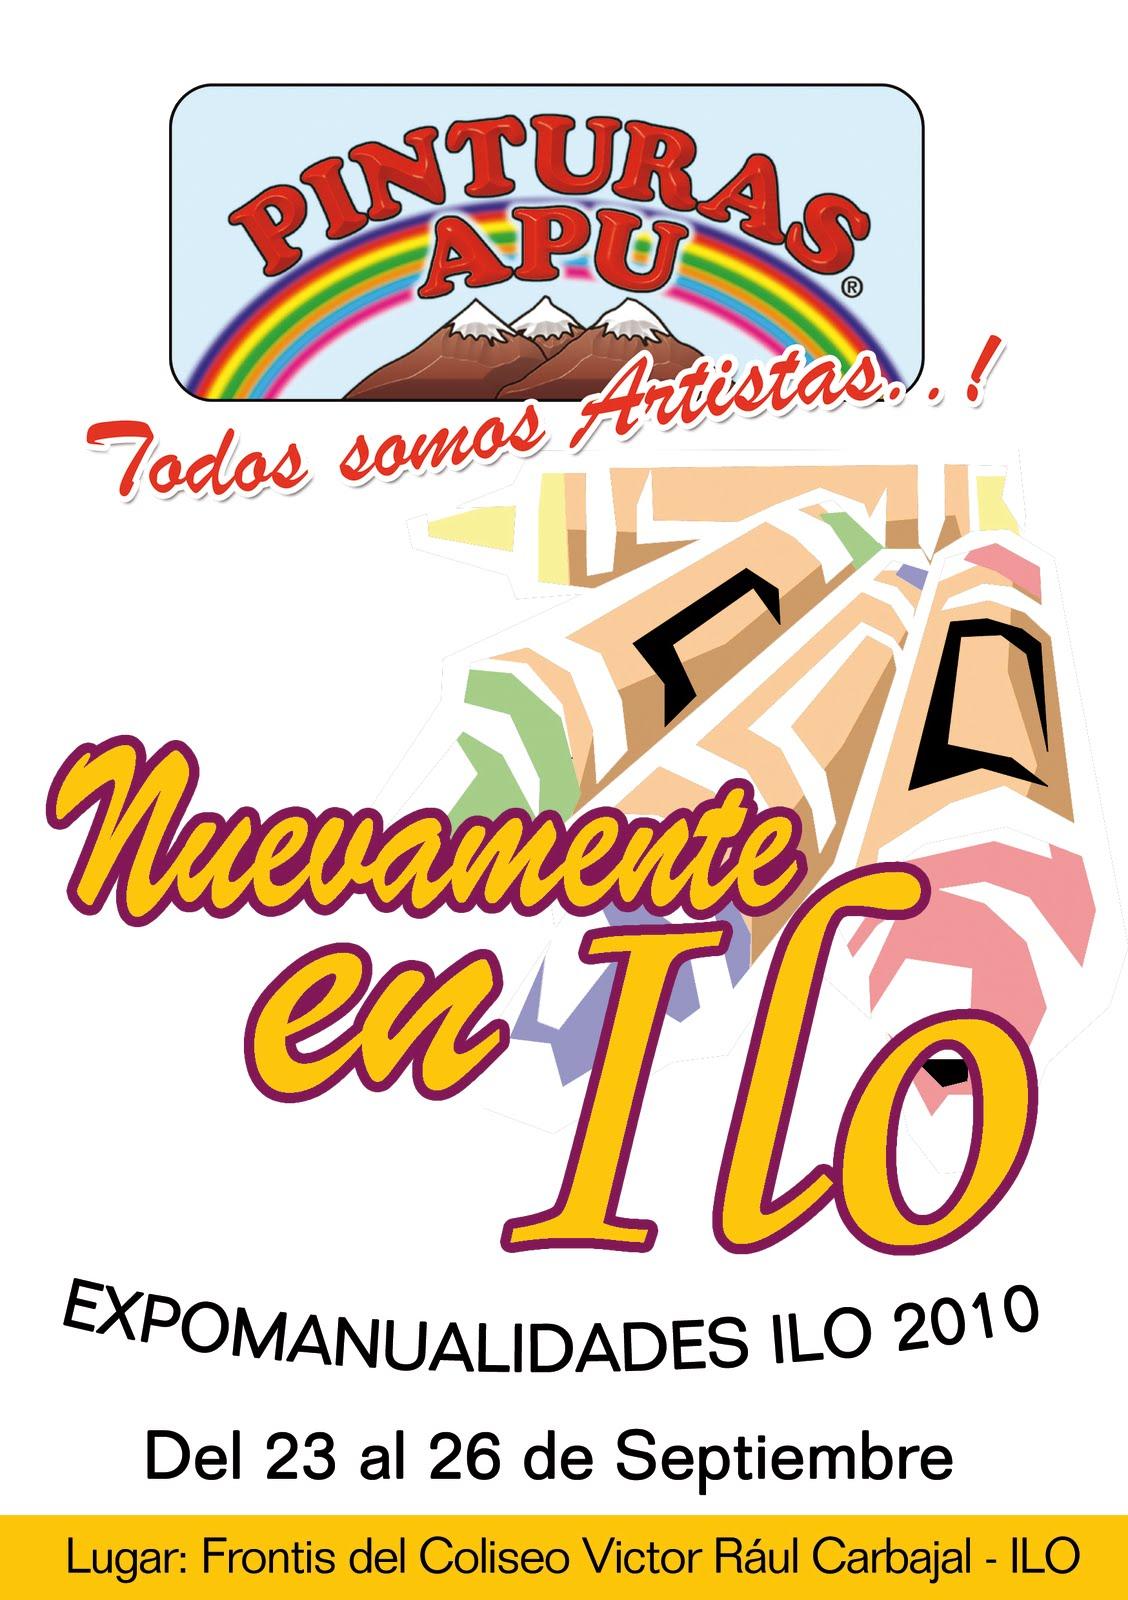 Pinturas apu feria de manualidades ilo - Feria de manualidades en barcelona ...